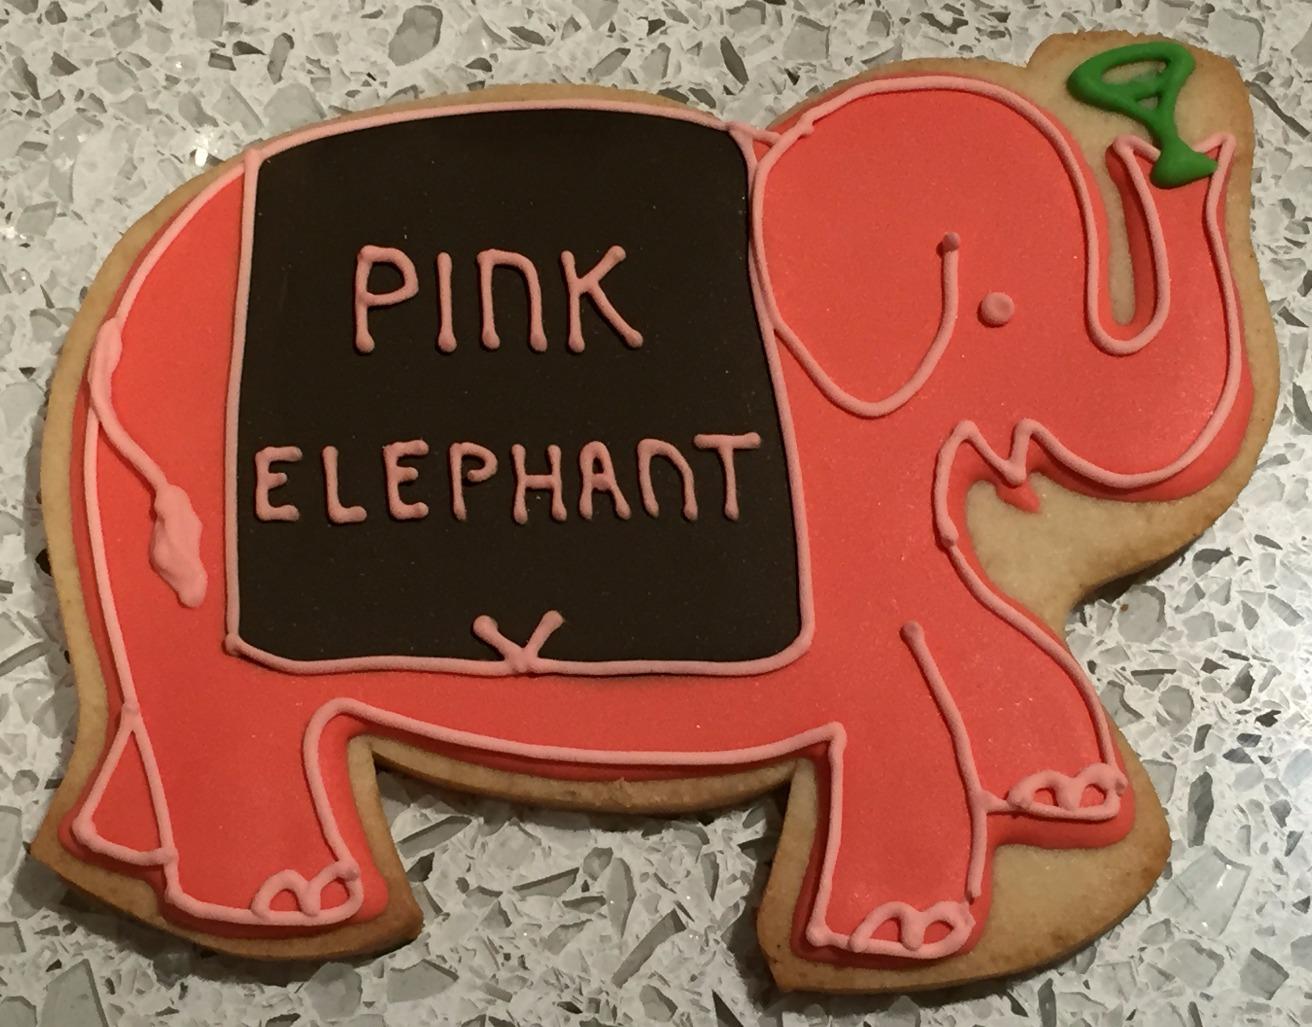 Pink Elephant Bar